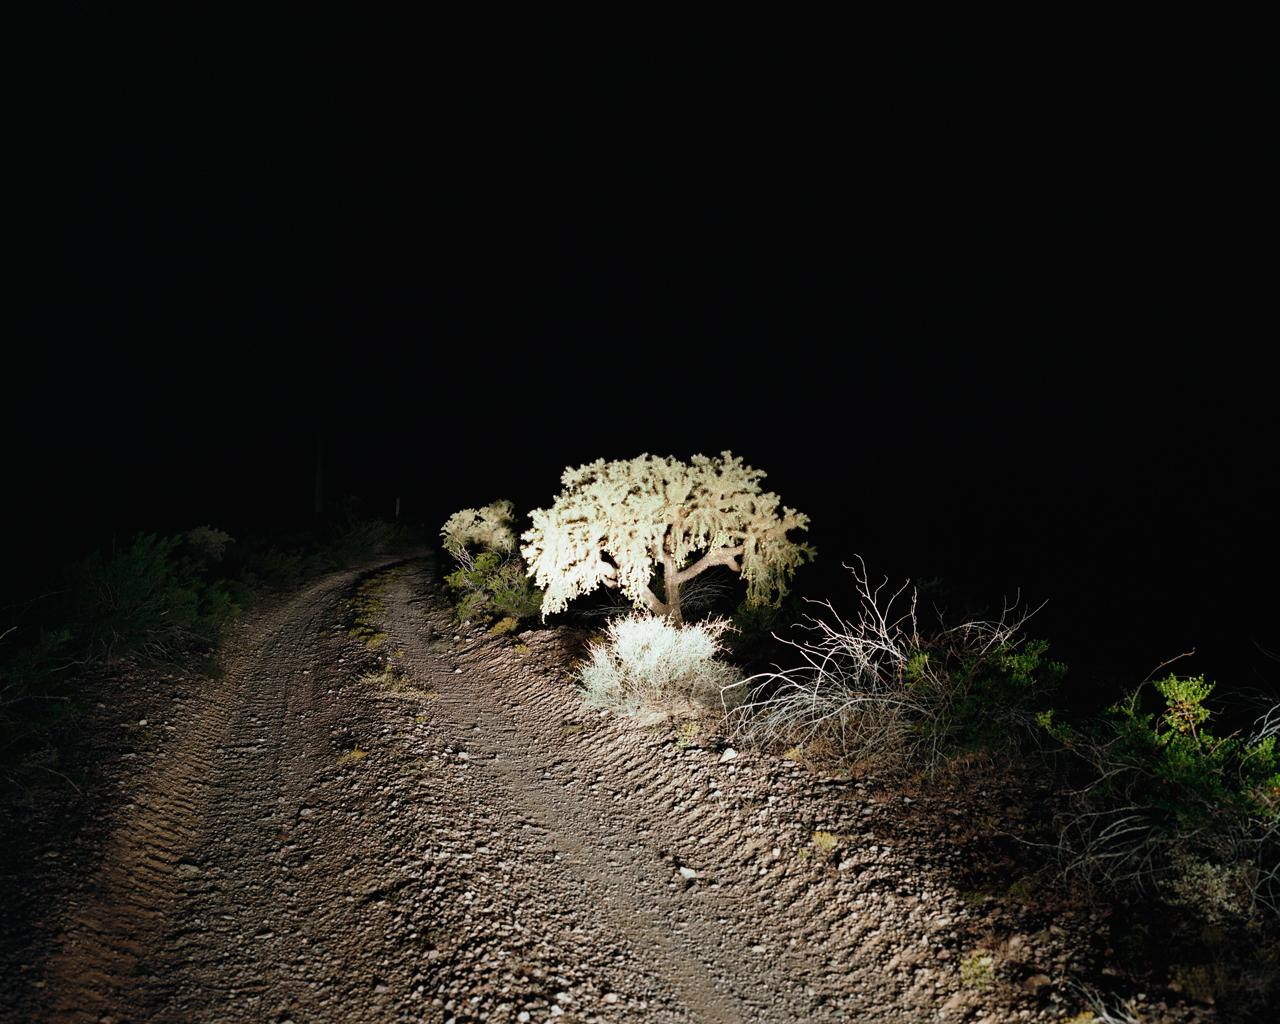 Nighttime Cholla, Barry M. Goldwater Bombing Range East, Arizona